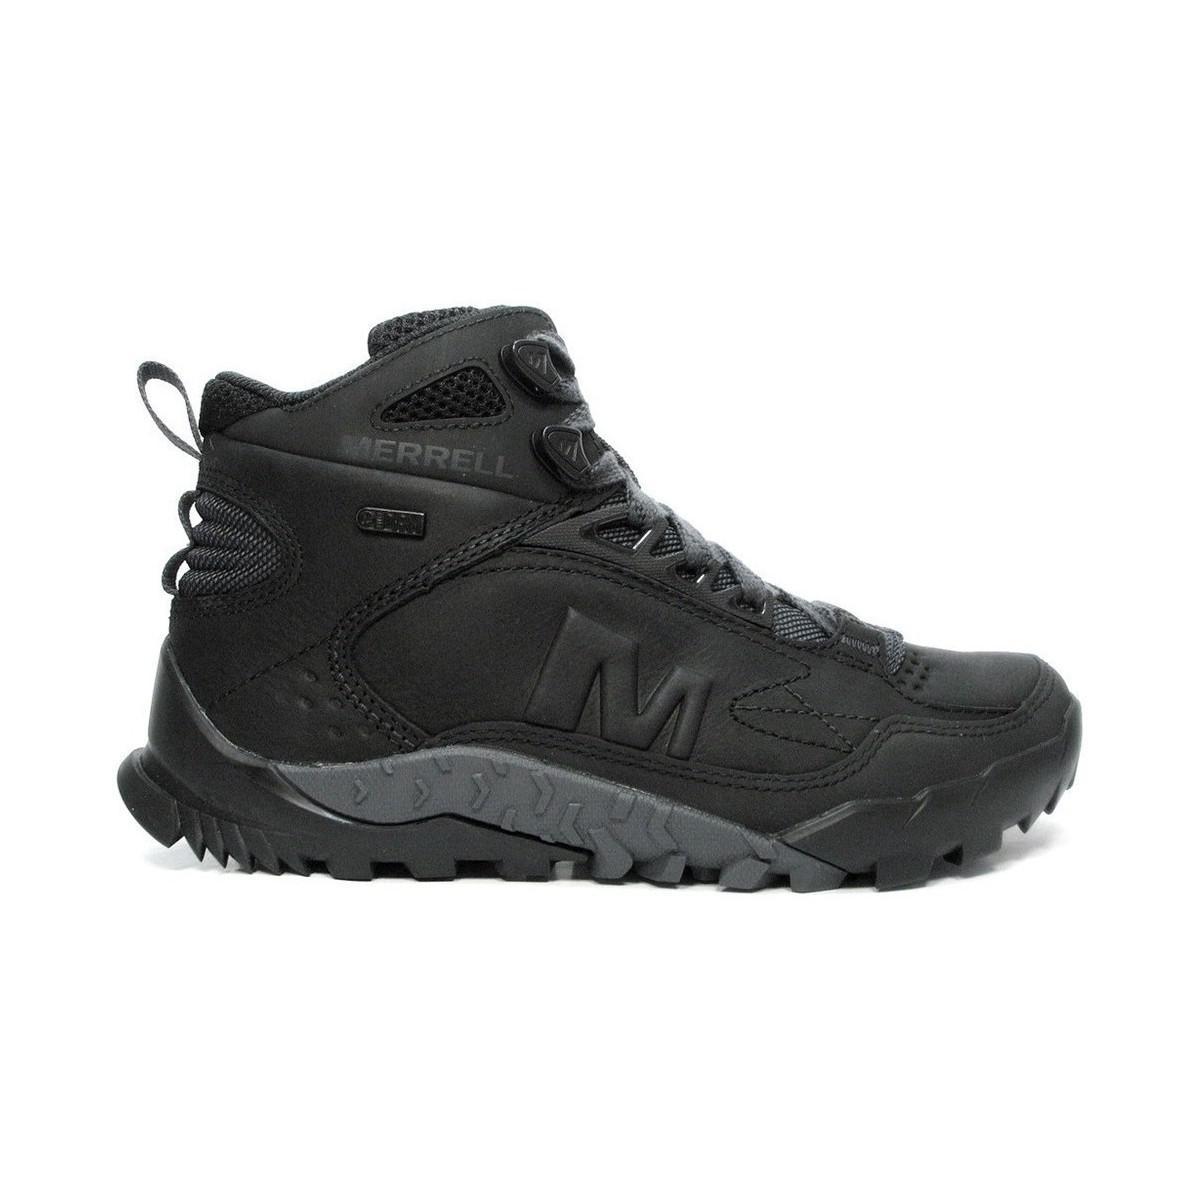 c79744a1dcd Merrell Annex Trak Mid Waterproof Men's Walking Boots In Black for men